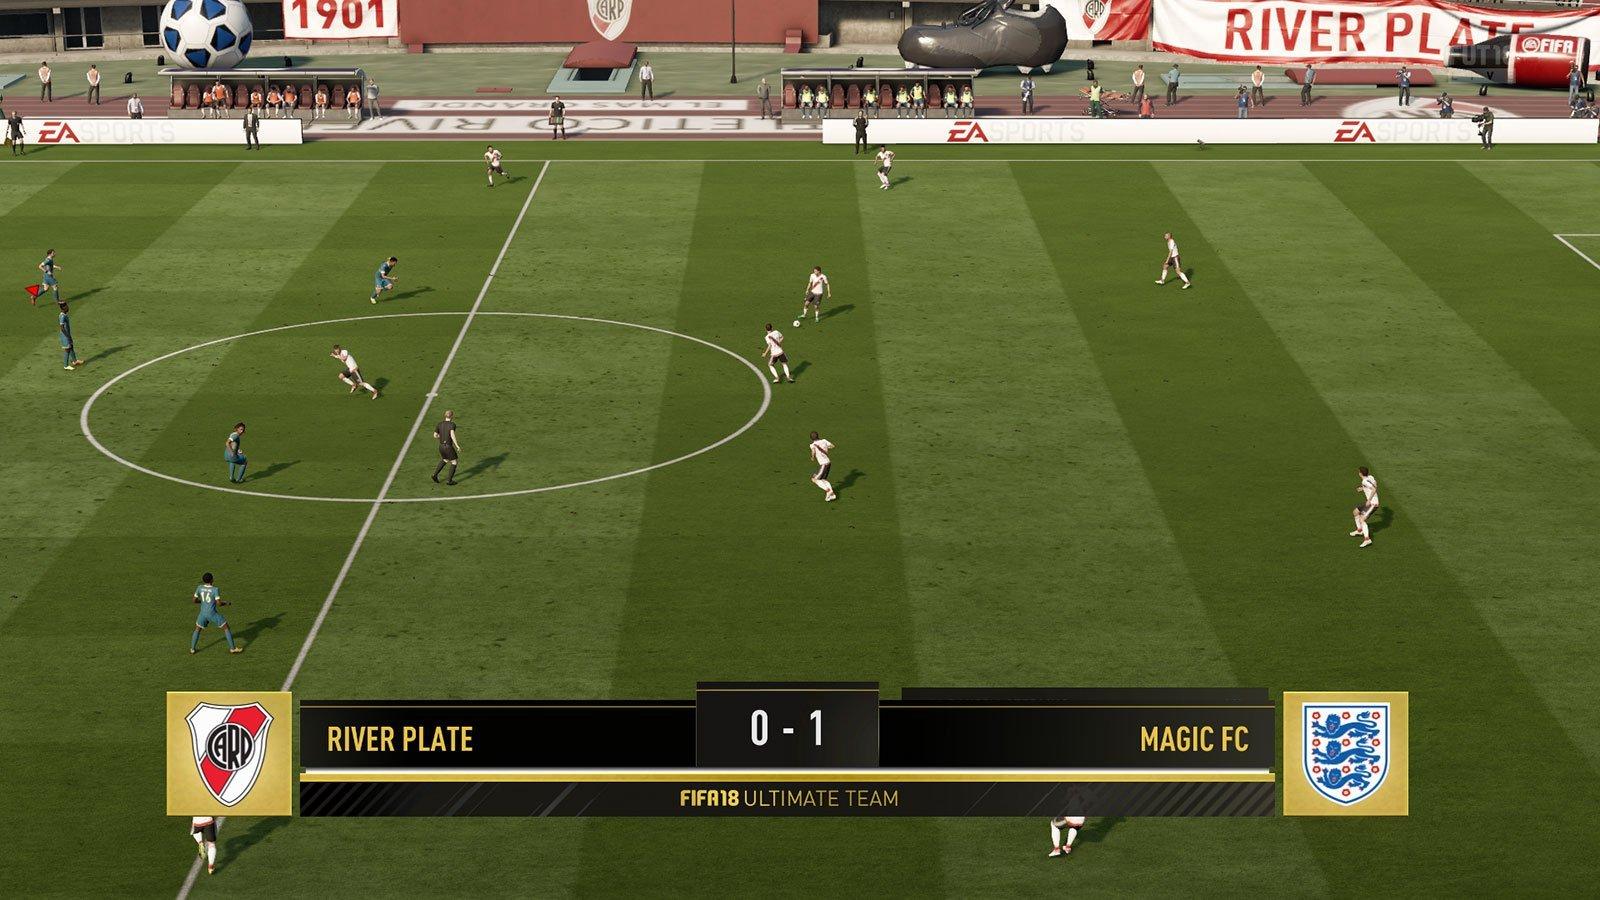 FIFA 18 Screenshot 2017.10.01 00.20.34